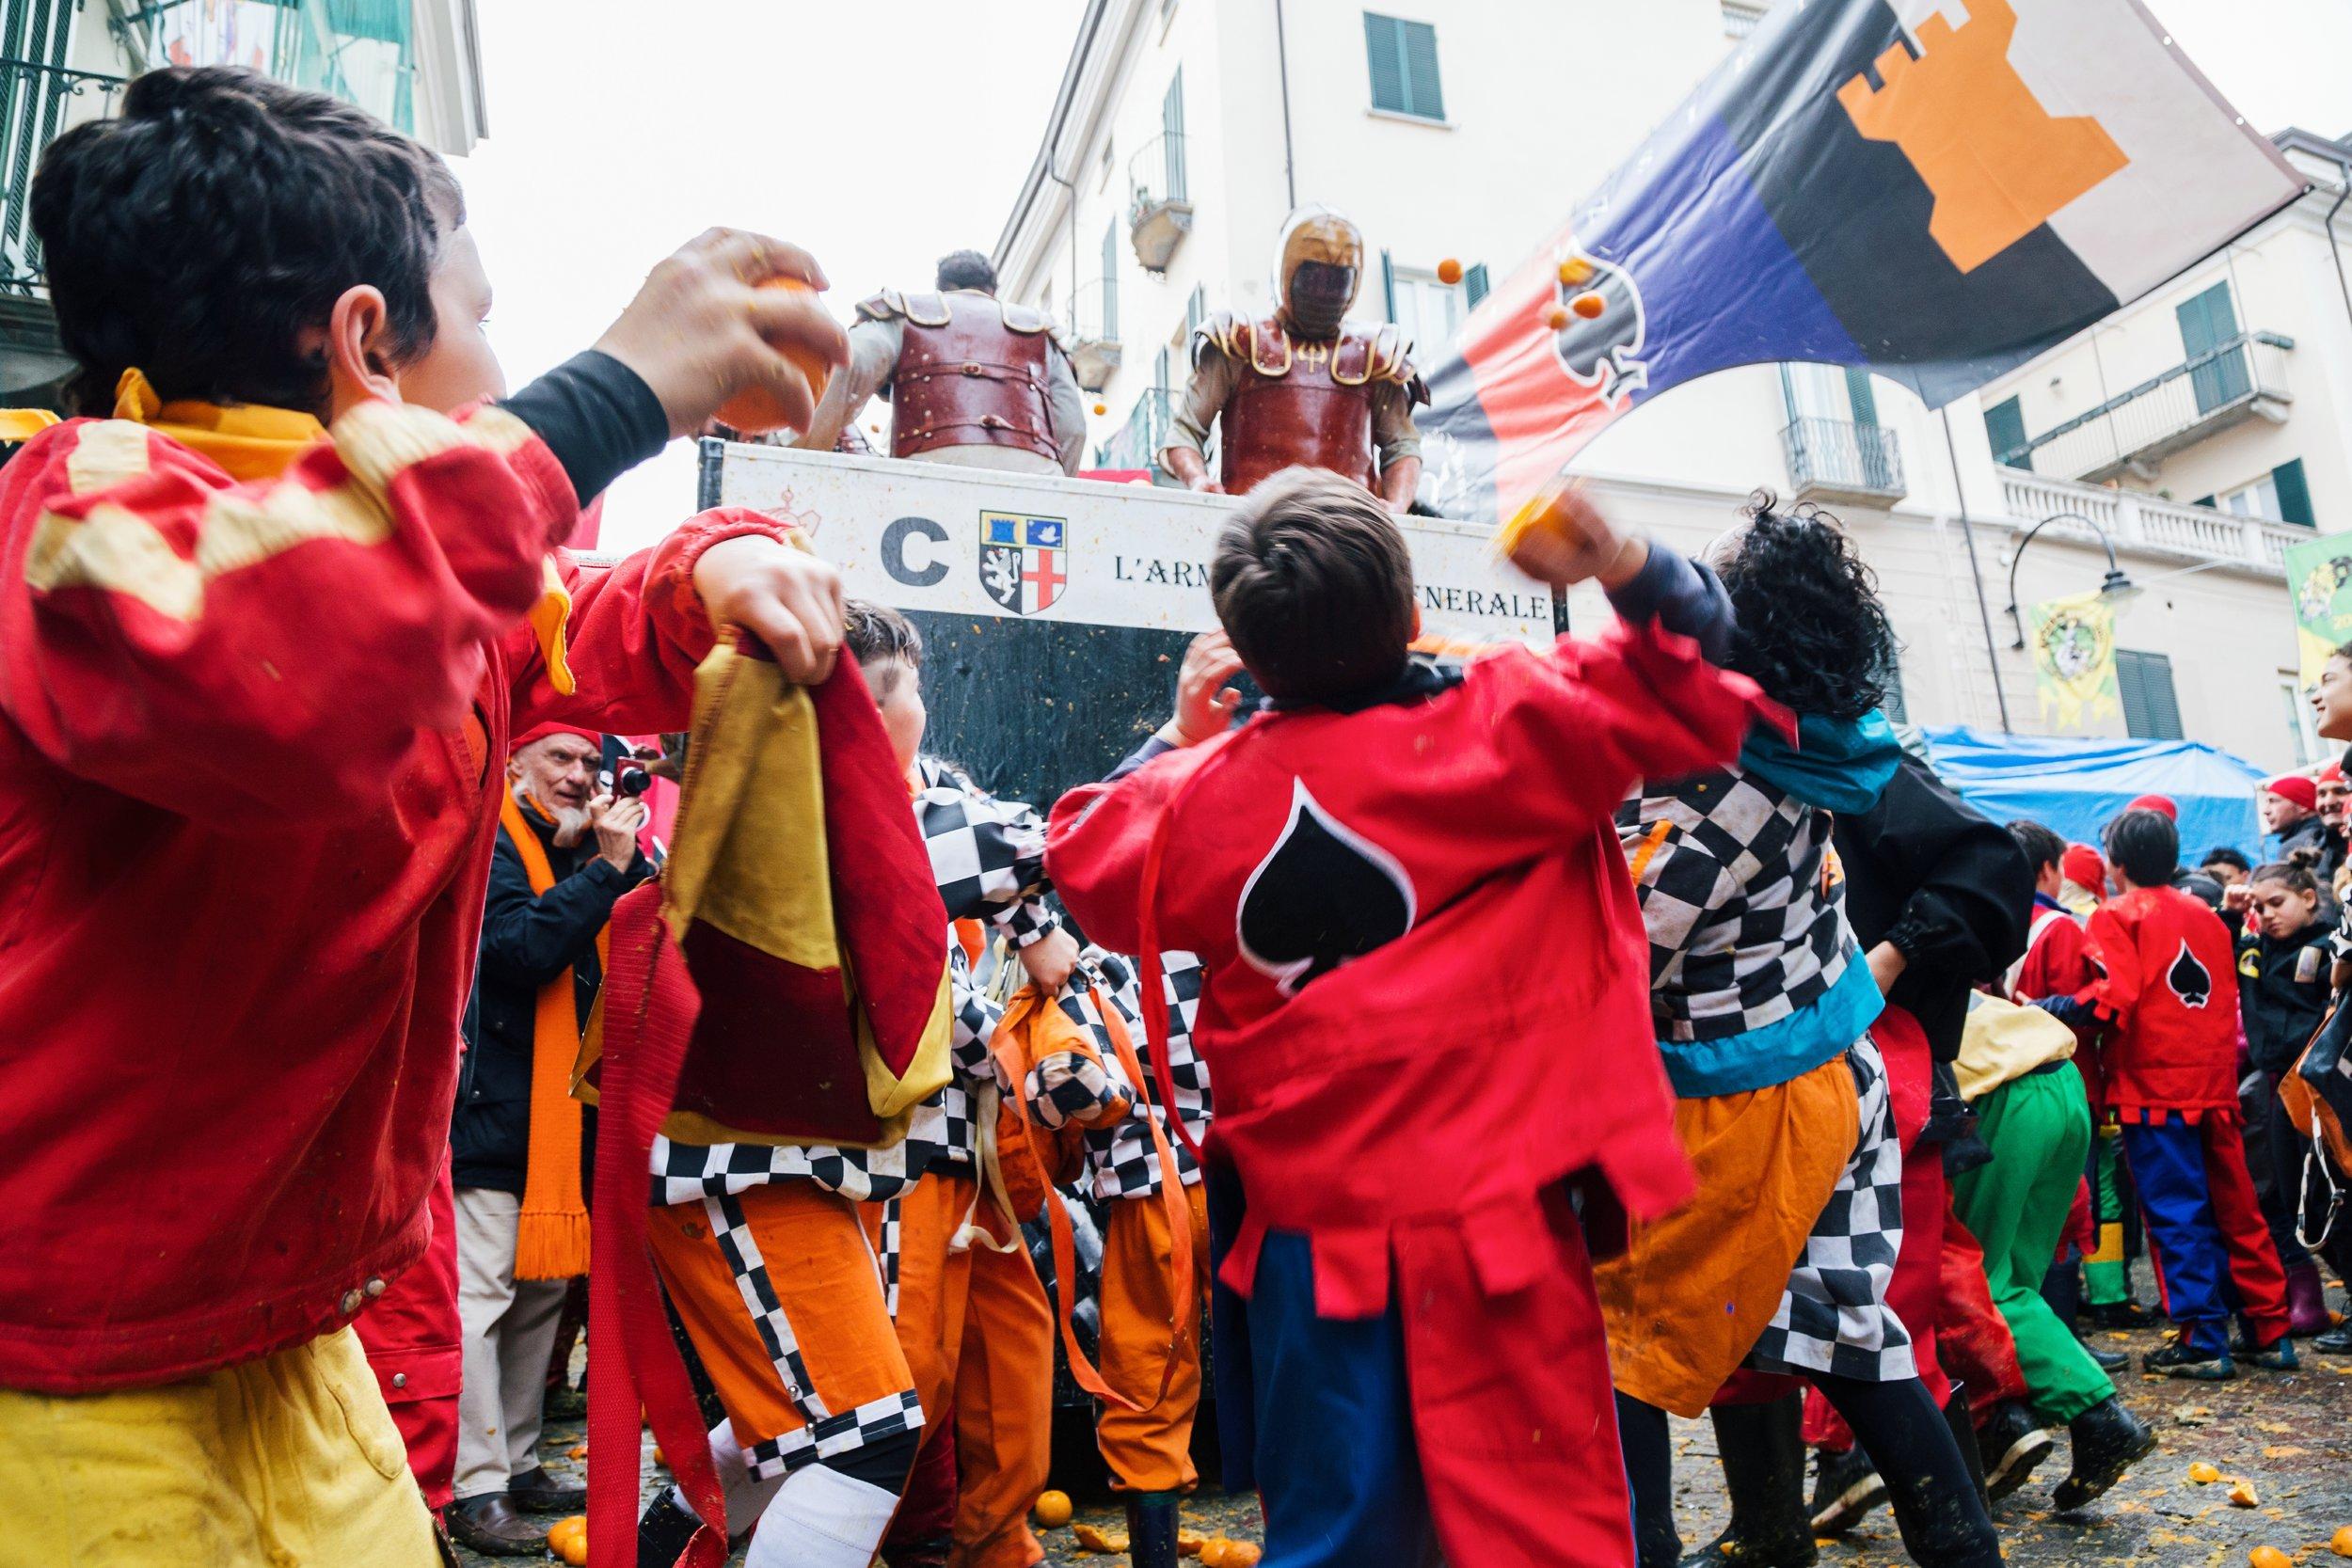 Carnevale di Ivrea 2017 HR © Ivan Blanco Vilar (9).jpg